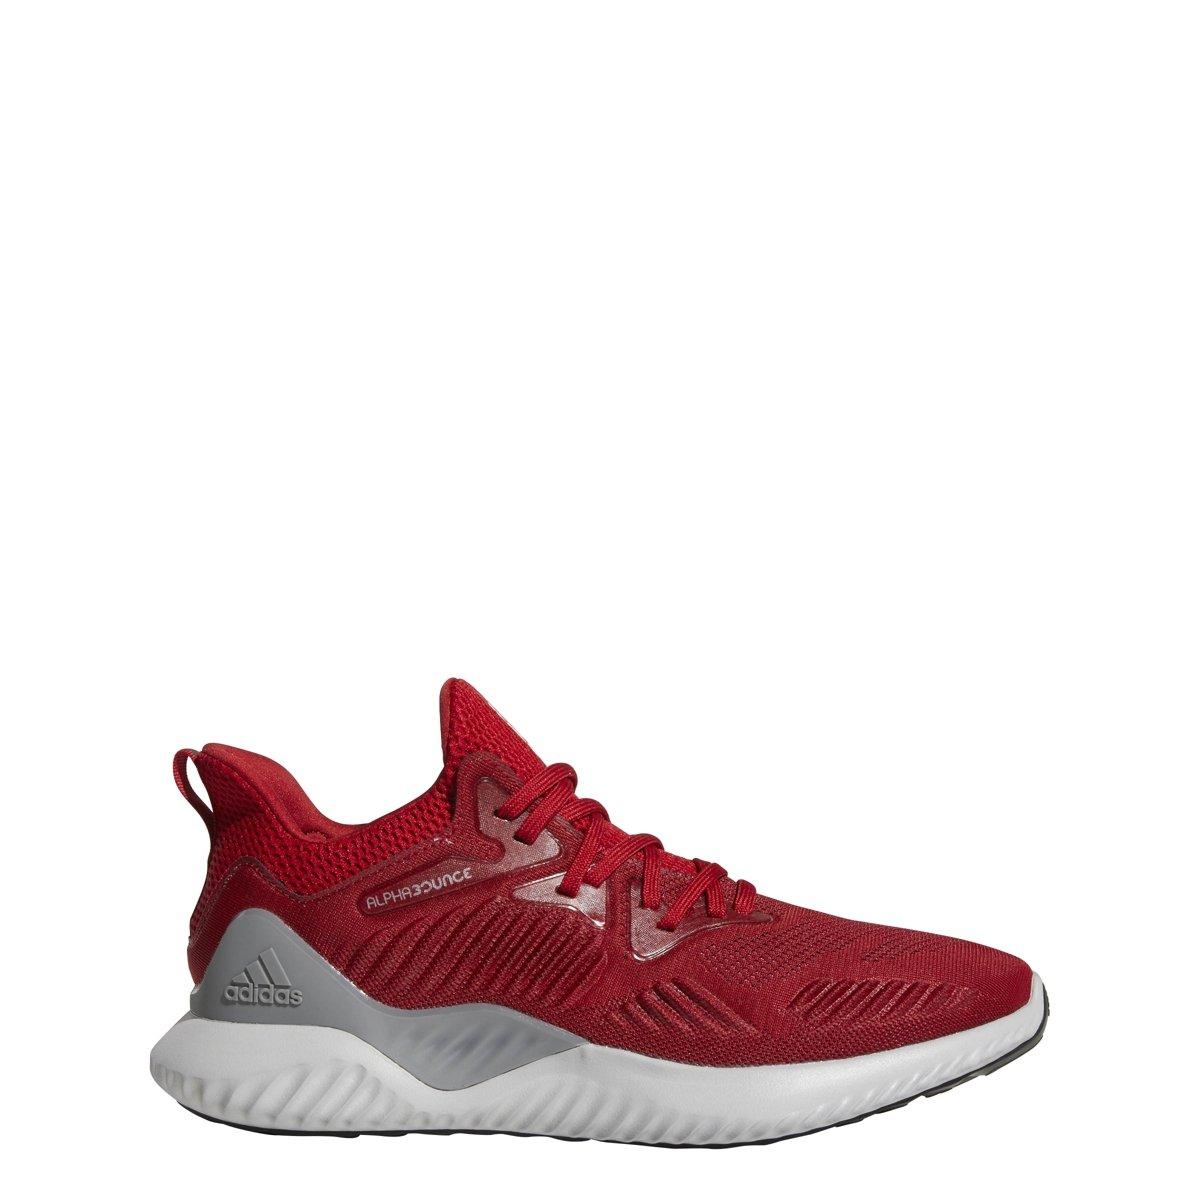 adidas Alphabounce Beyond Team Shoe Men's Running B077XNZRQV 8.5 D(M) US|Power Red/White/Black